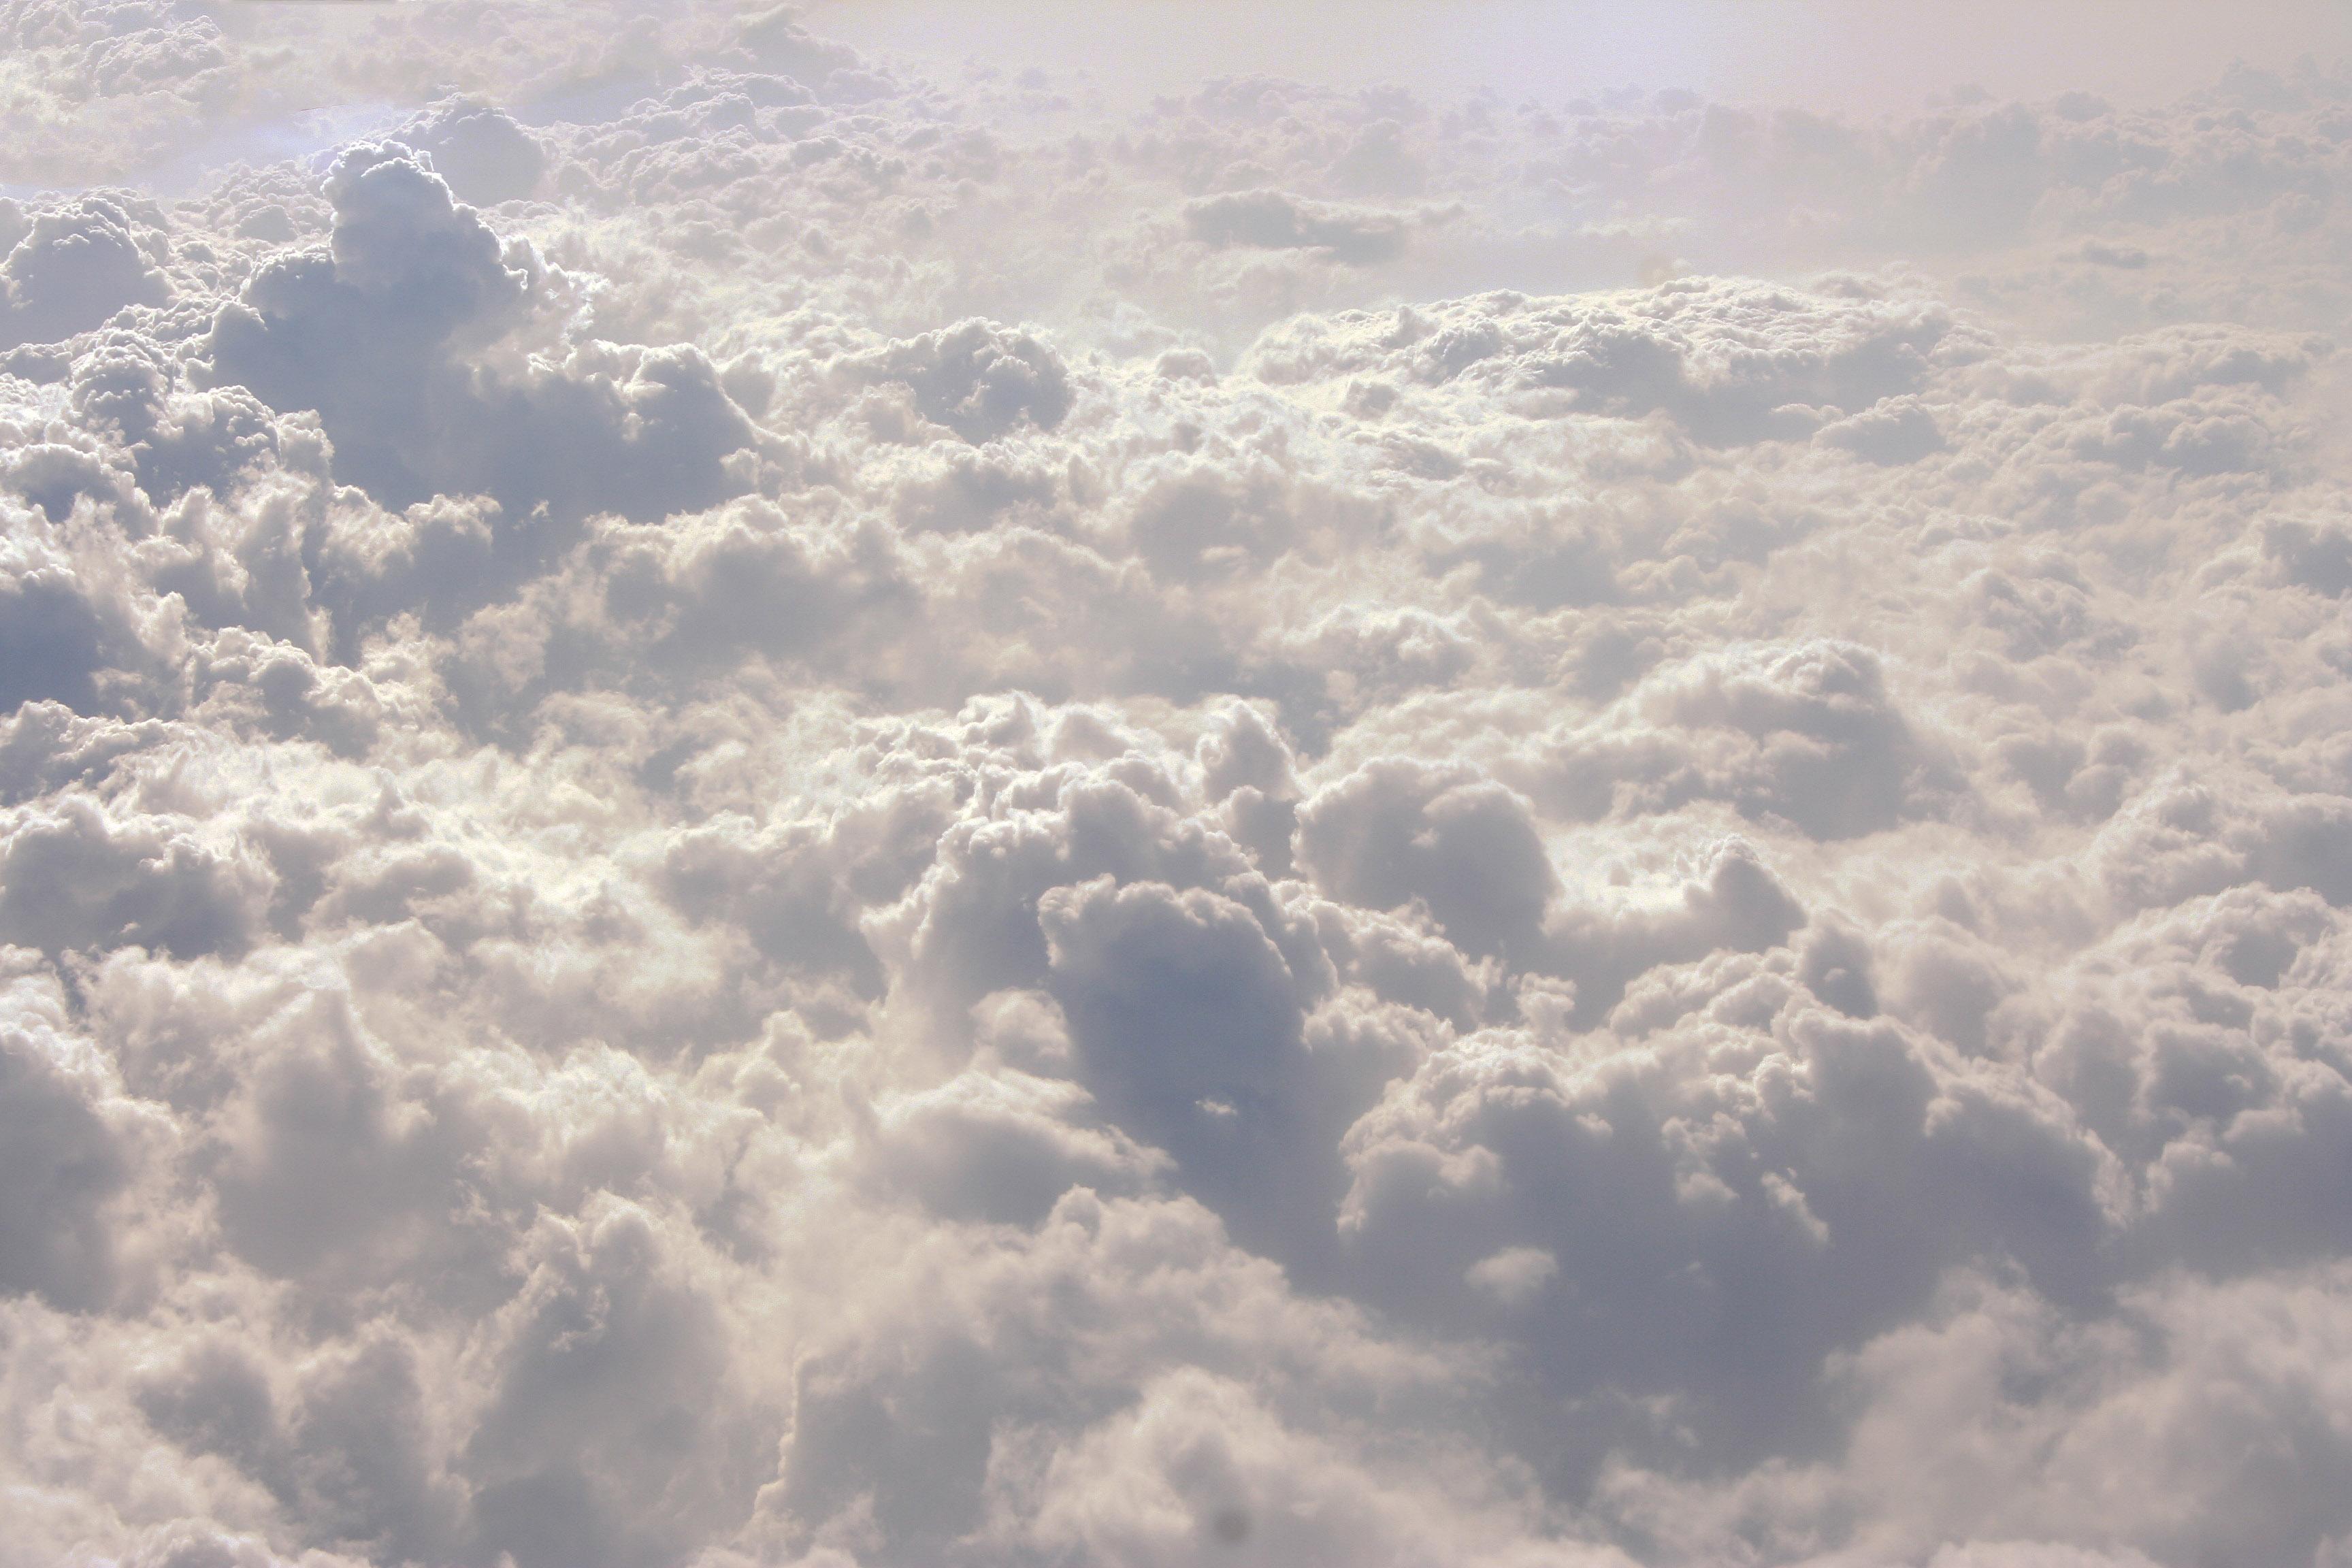 cloud texture above clouds fairy tale sky texture - TextureX- Free ...